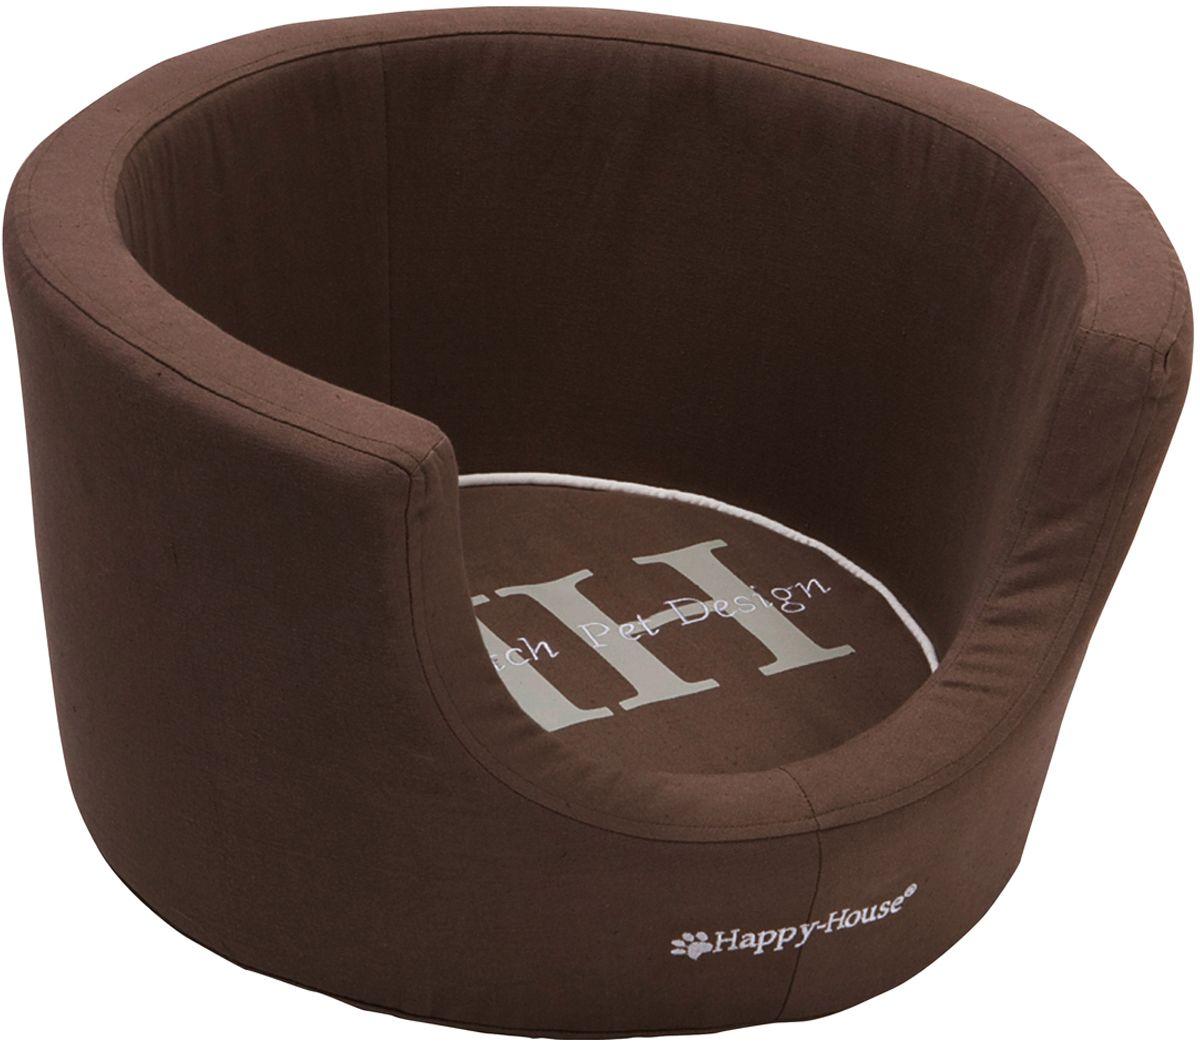 Корзина для домашних животных Happy House Canvas Comfort, цвет: коричневый, 52х52х31 см8912-4